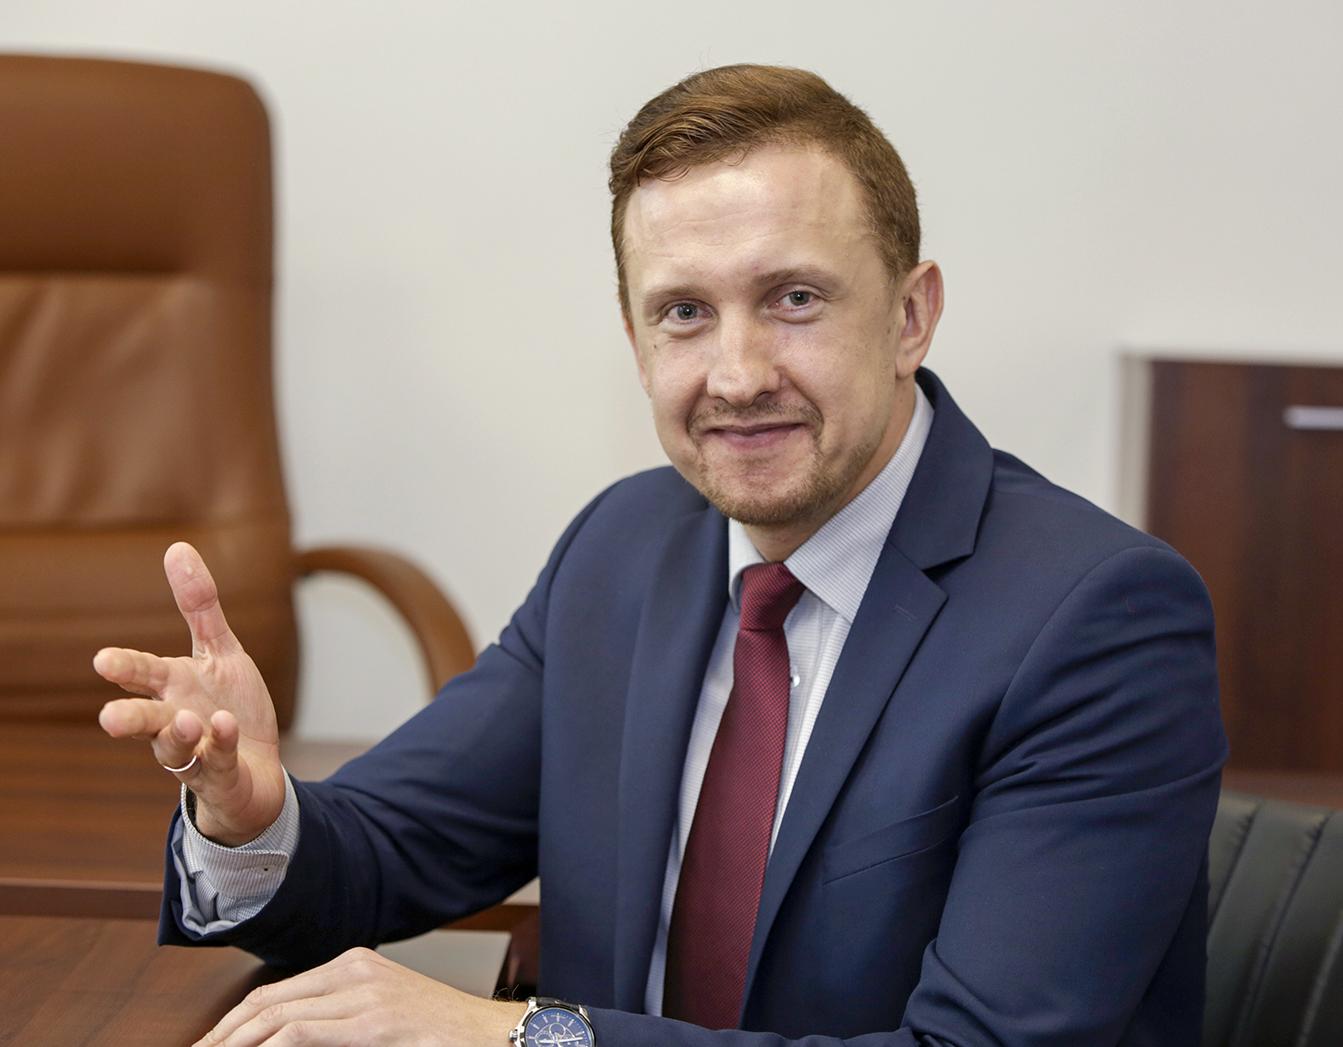 Karolis Podolskis